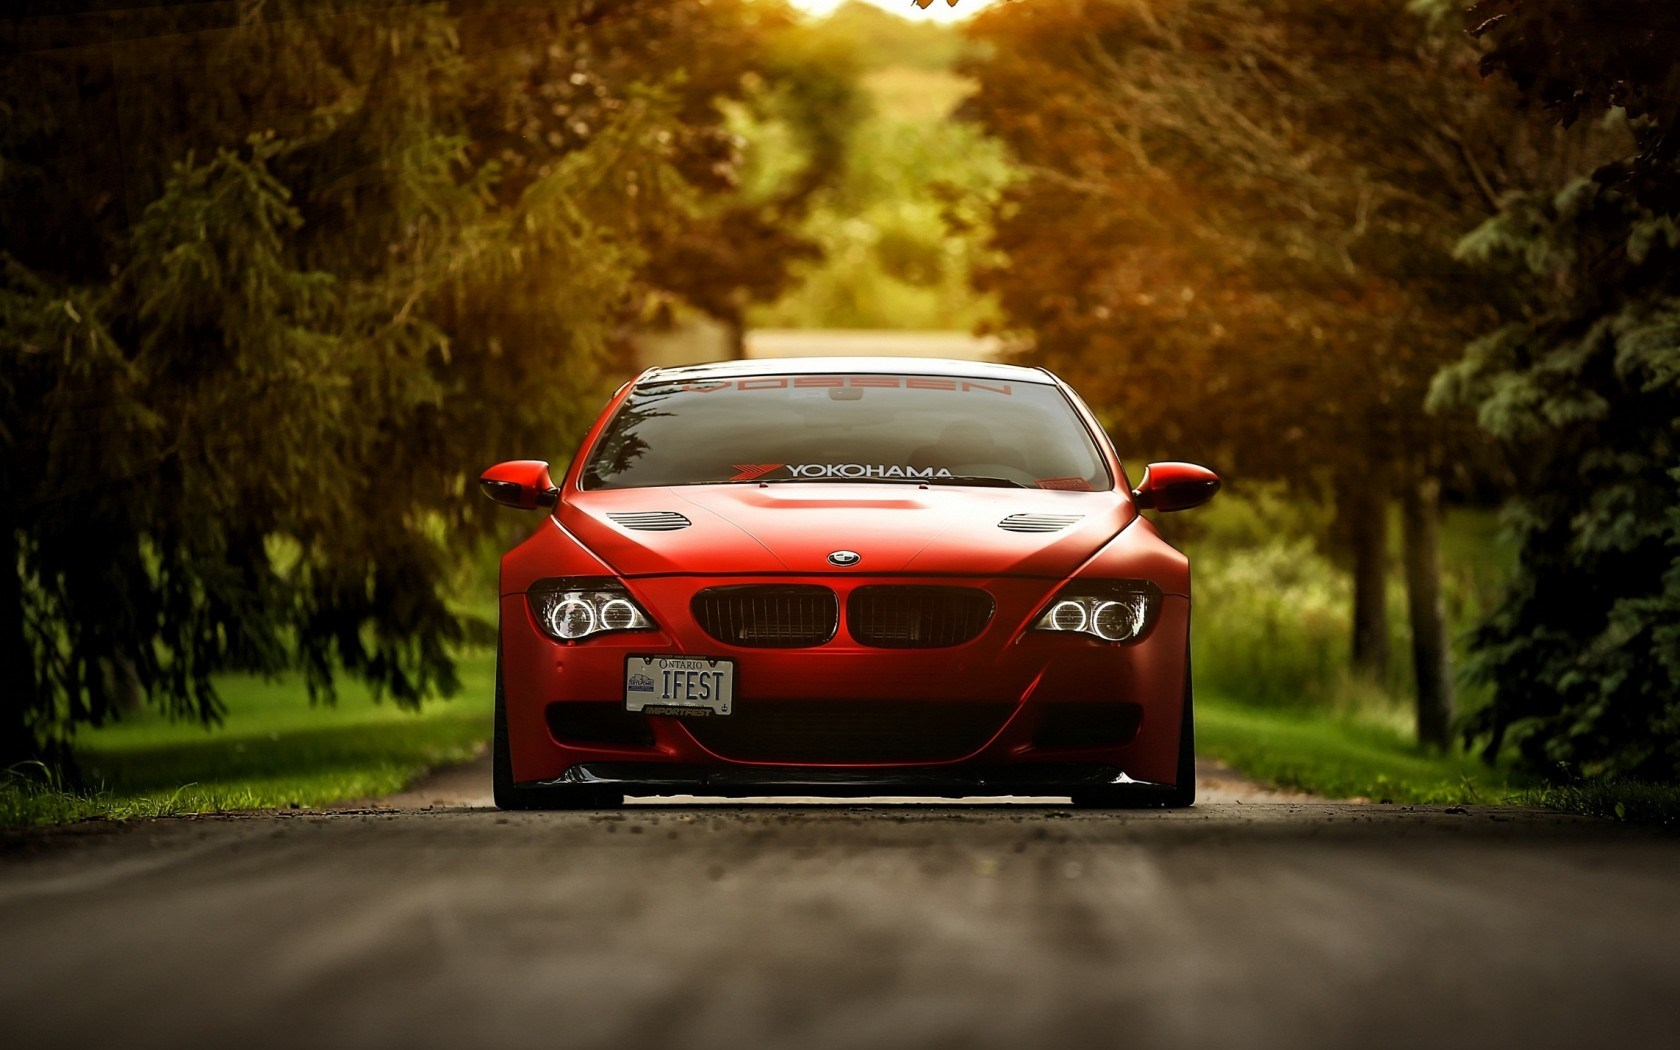 Bmw M6 E63 Red Car Wallpaper 1680x1050 16217